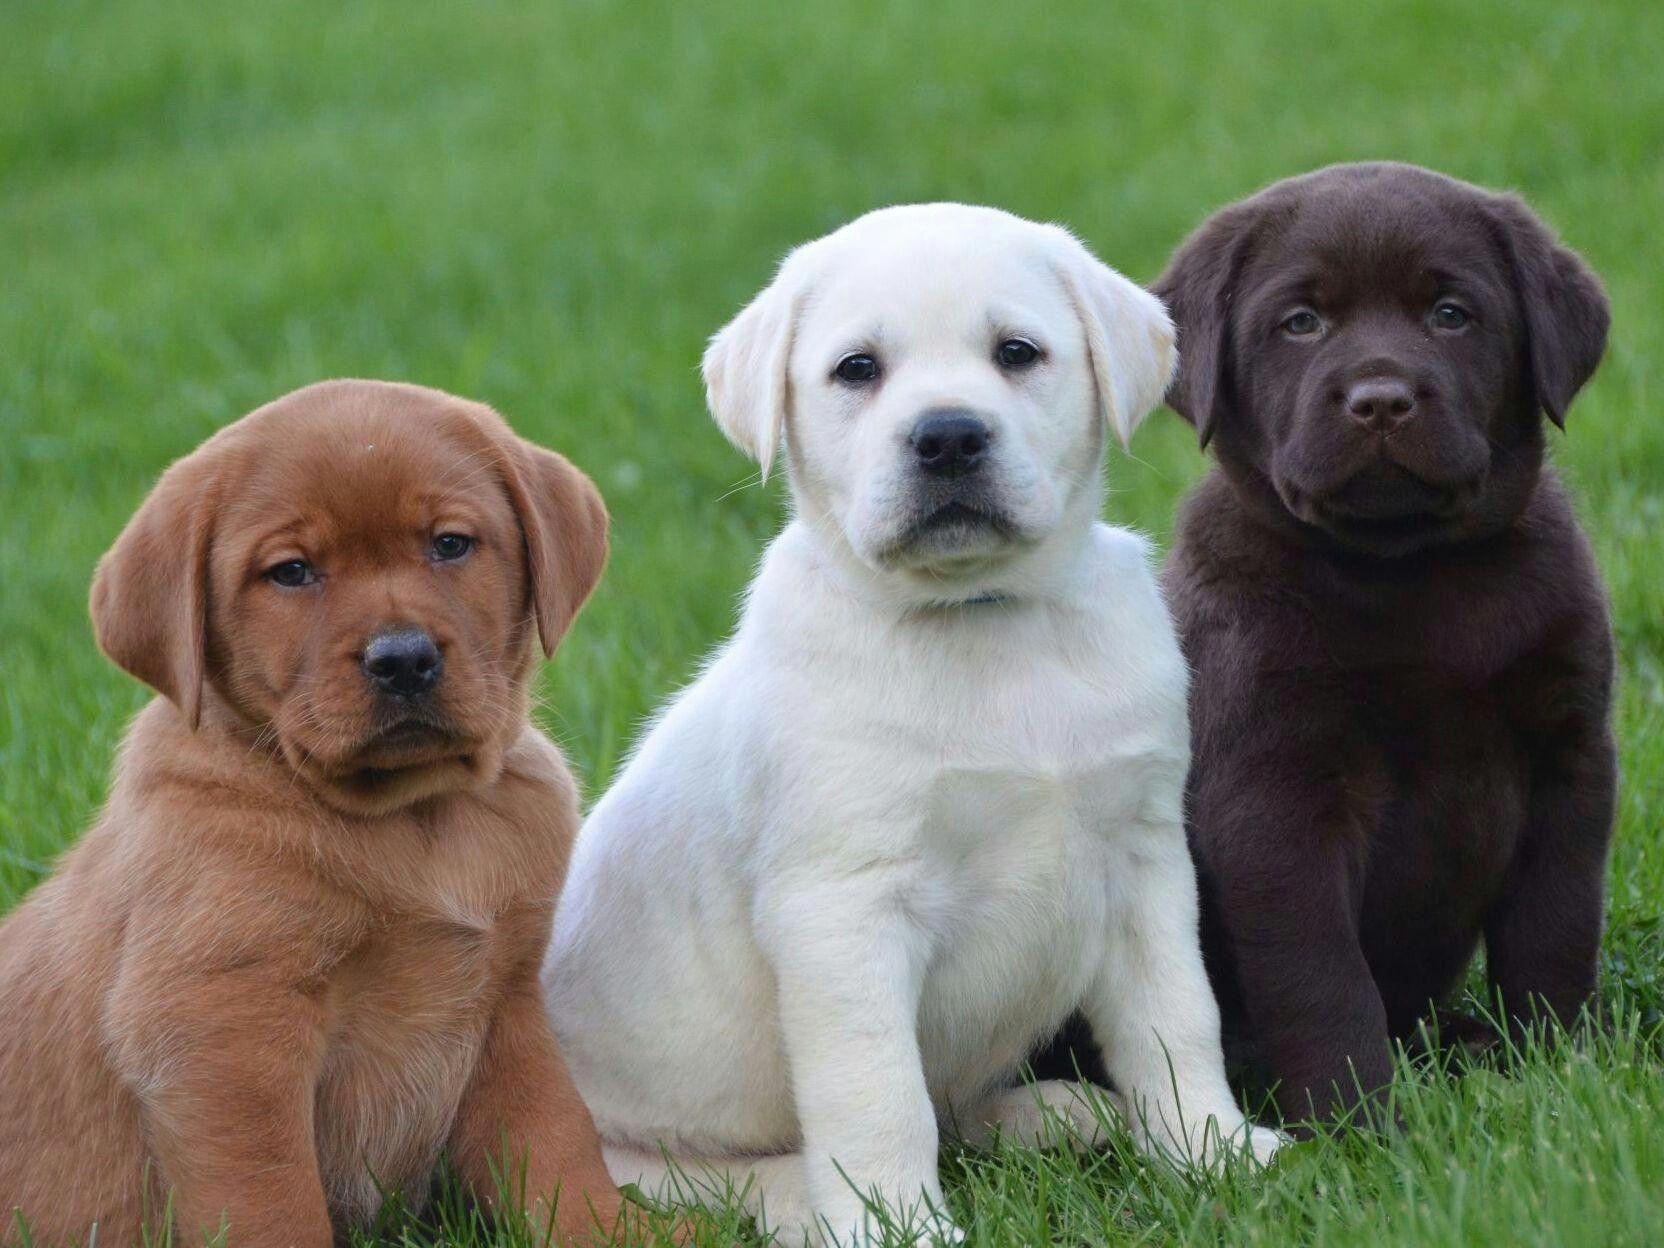 Lab Colors Puppies Labradortraining Labradorretriever Labrador Retriever English Lab Puppies Labrador Puppy